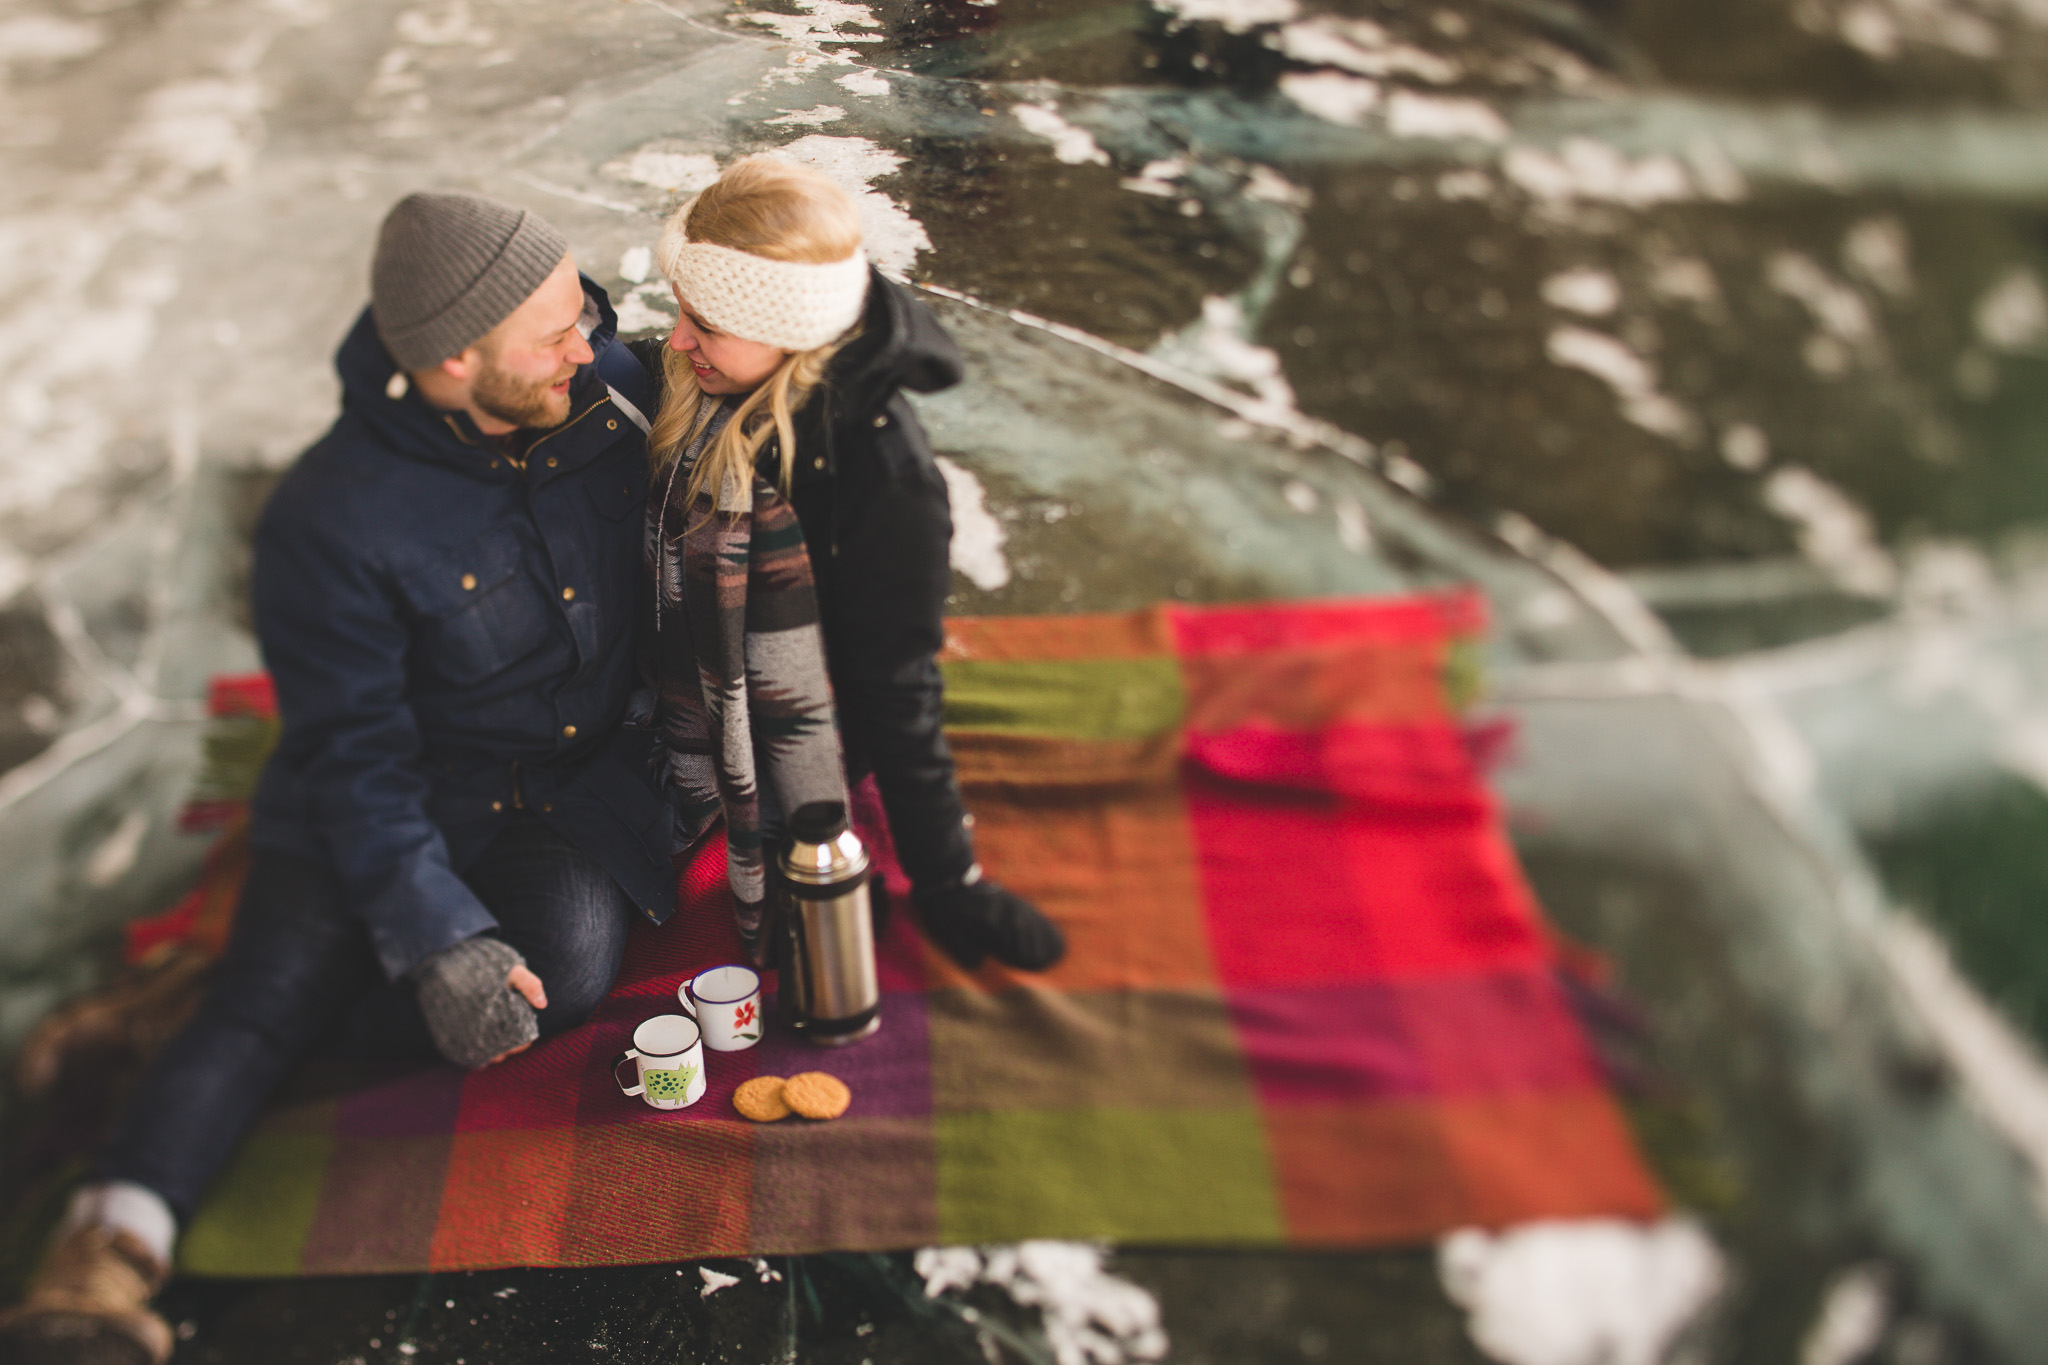 Picnic-Engagement-Session-Winter